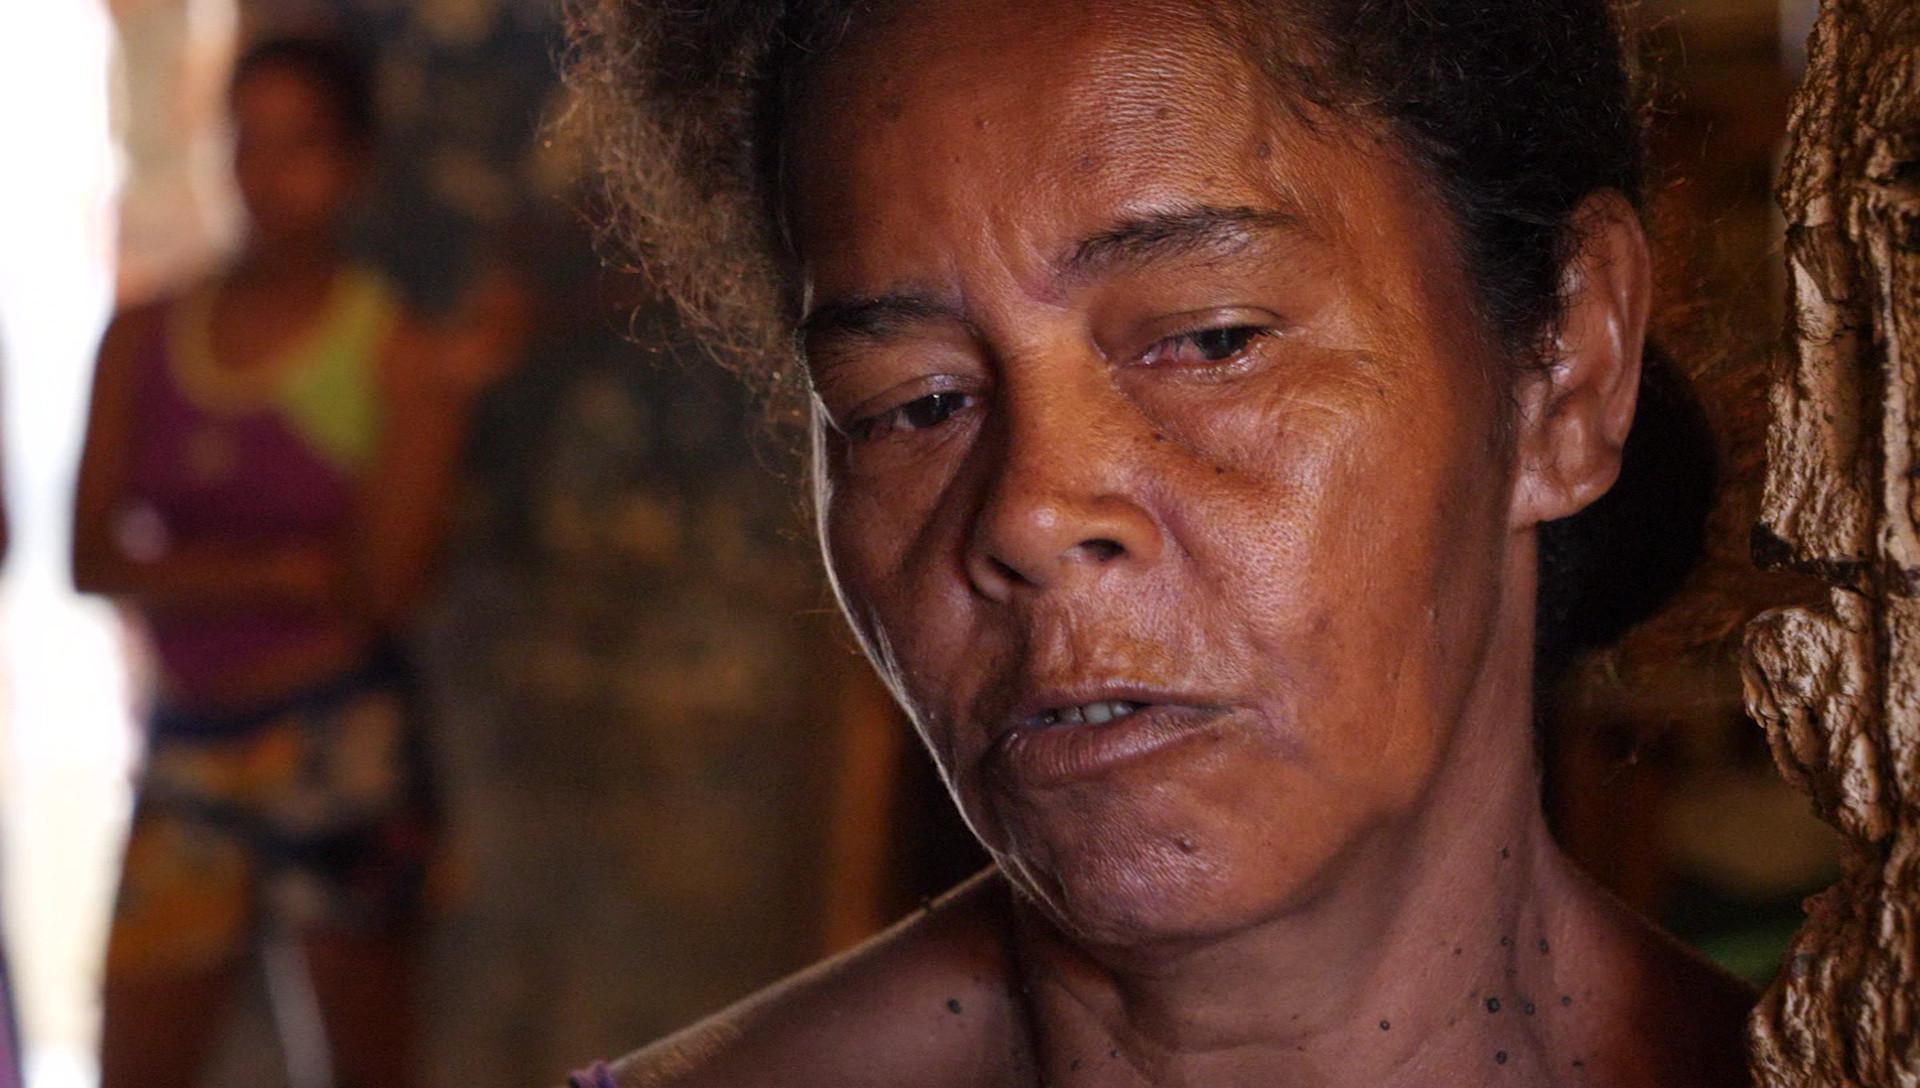 170515170551-03-venezuela-undercover-grandma